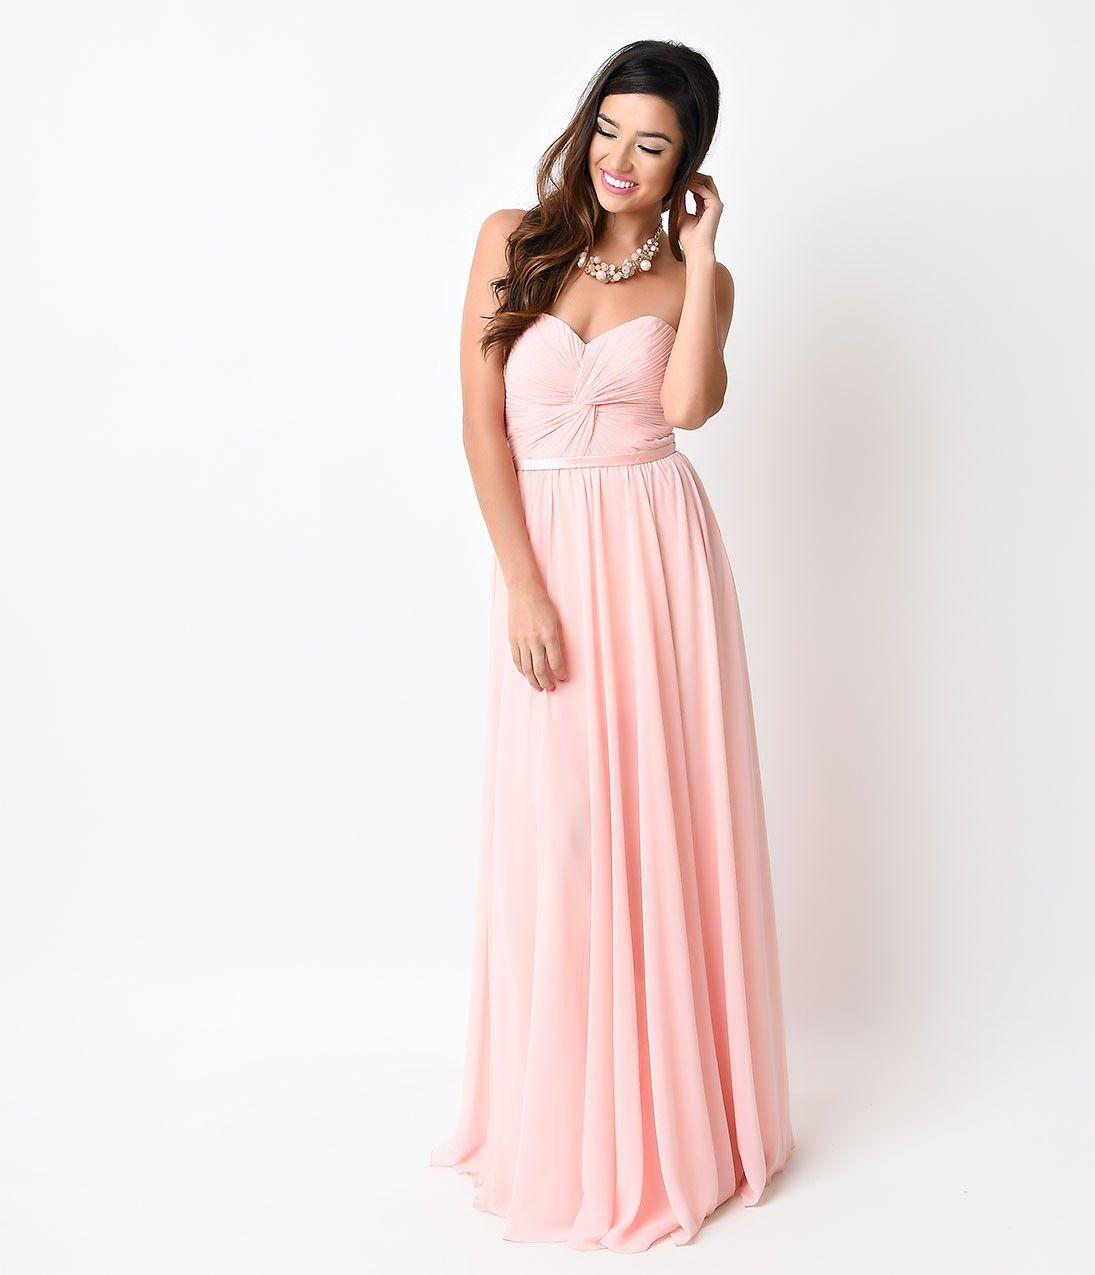 Blush Pink Chiffon Strapless Sweetheart Corset Long Gown